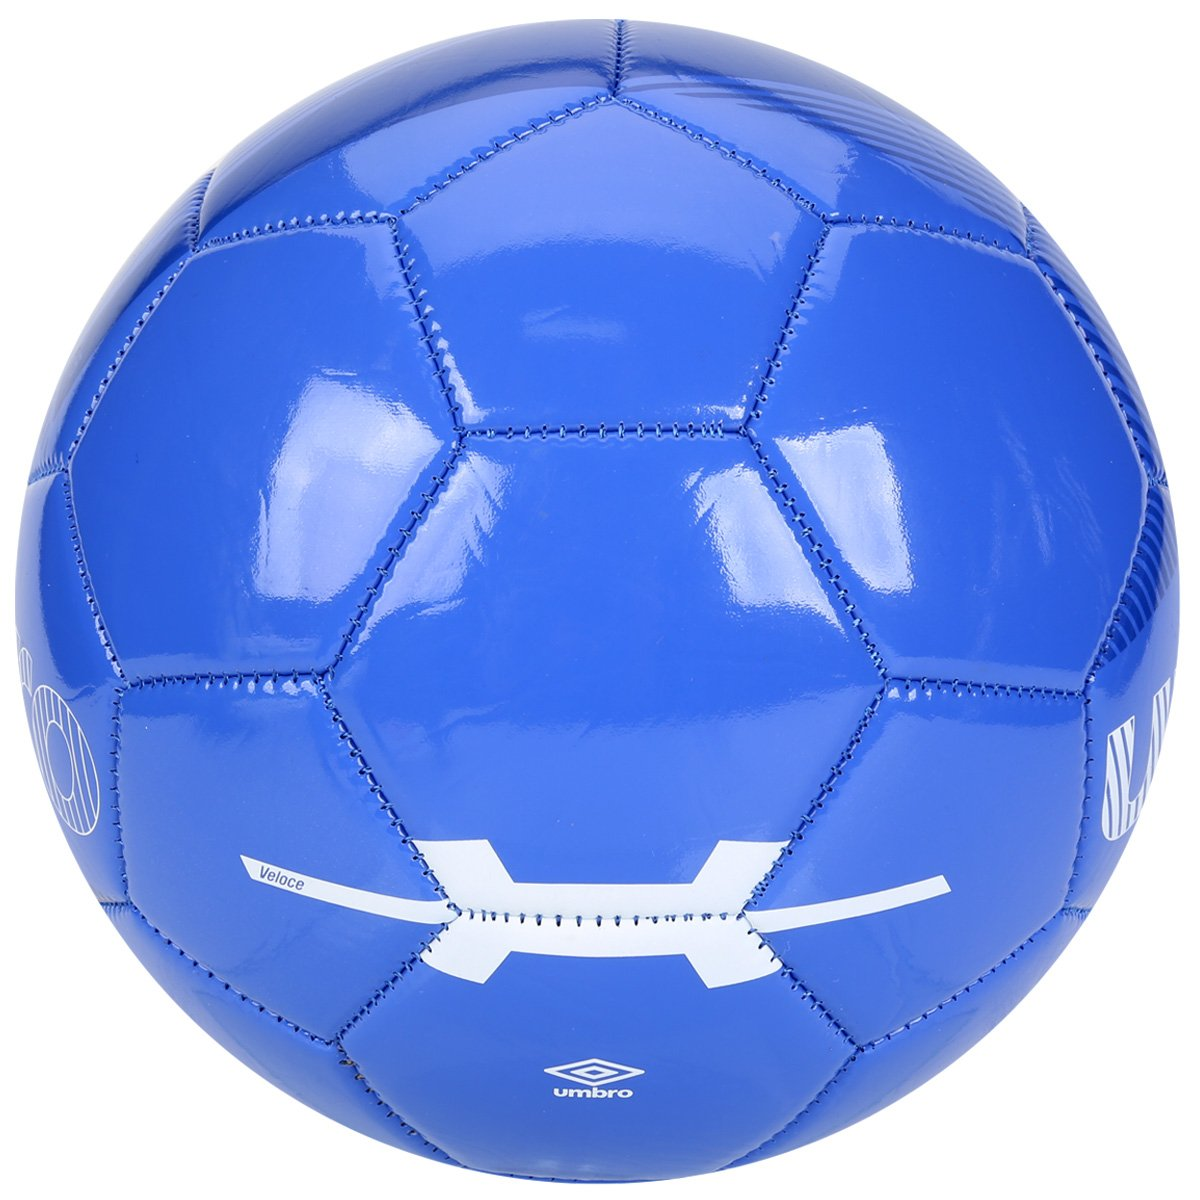 9873104b3e Bola Futebol Campo Umbro Veloce Supporter - Compre Agora